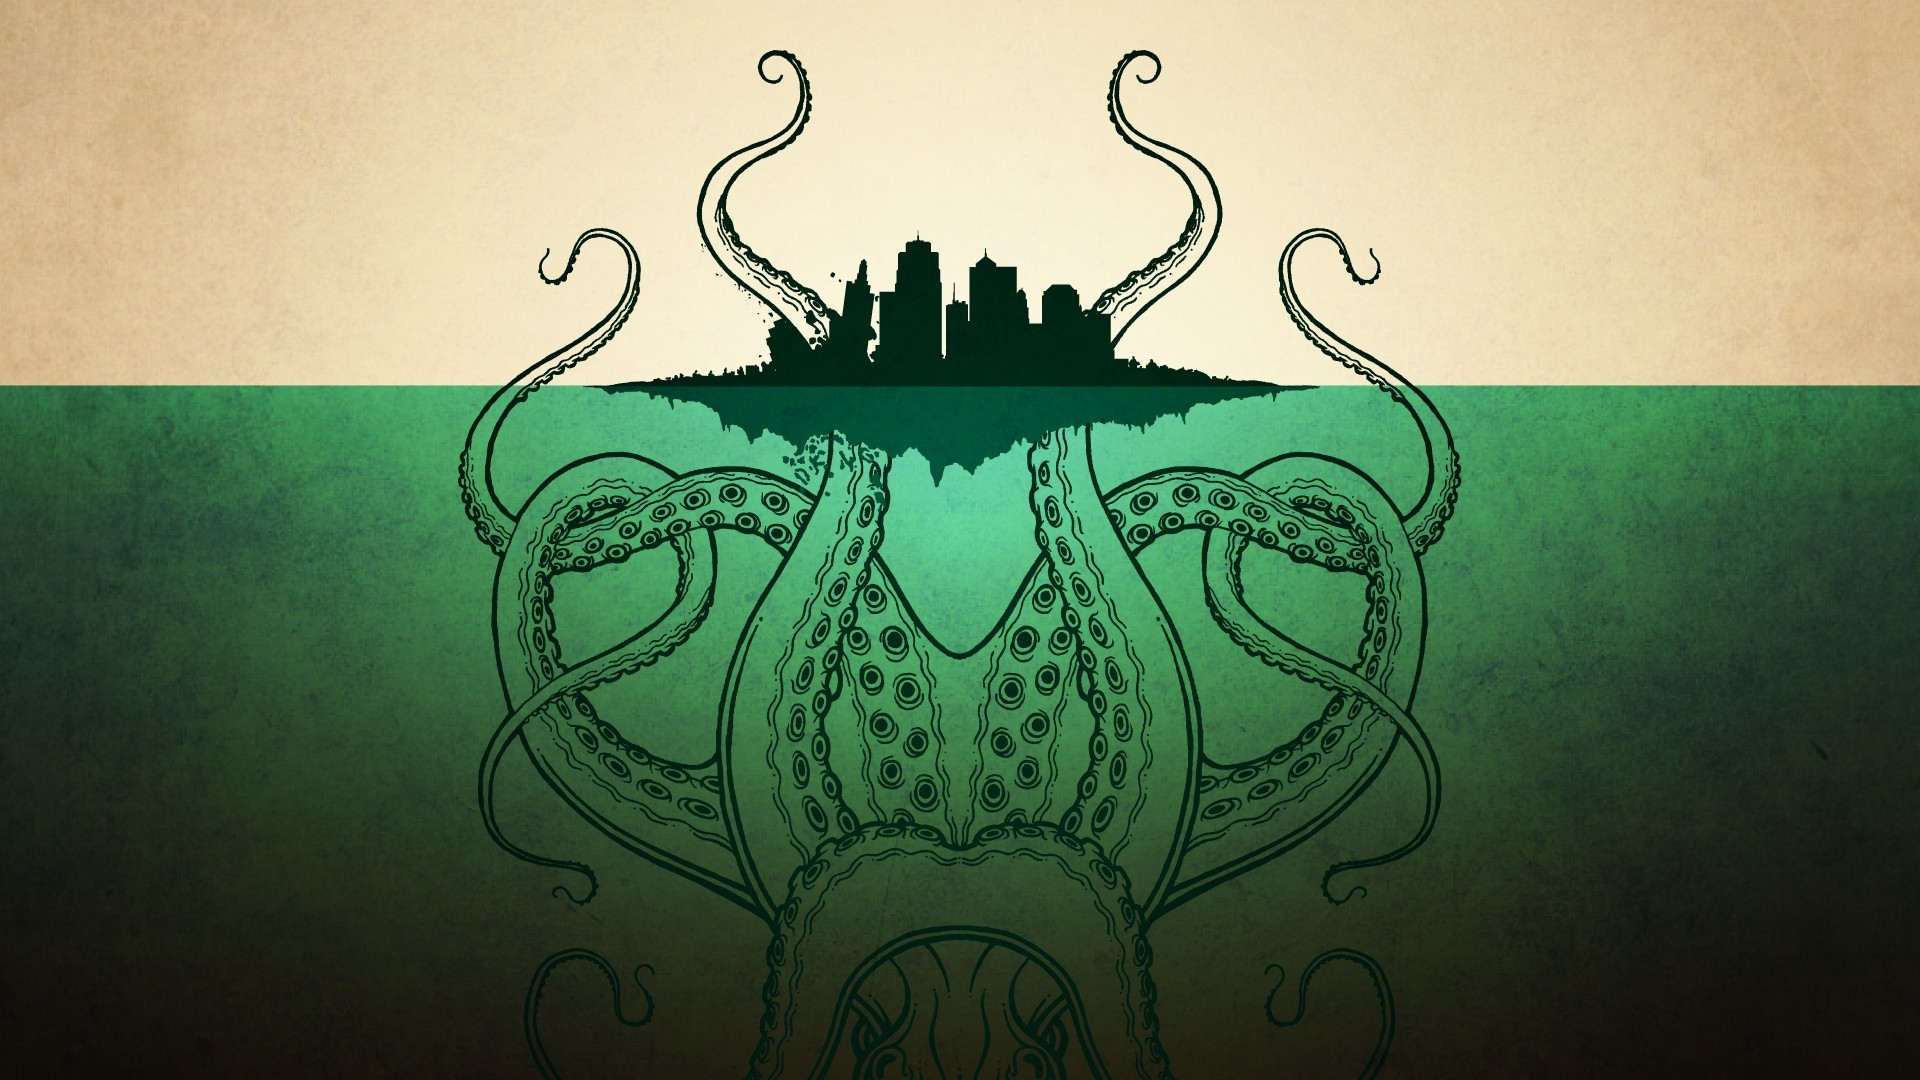 Res: 1920x1080, Octopus-HD-Wallpaper- | Download Free Desktop Wallpaper .